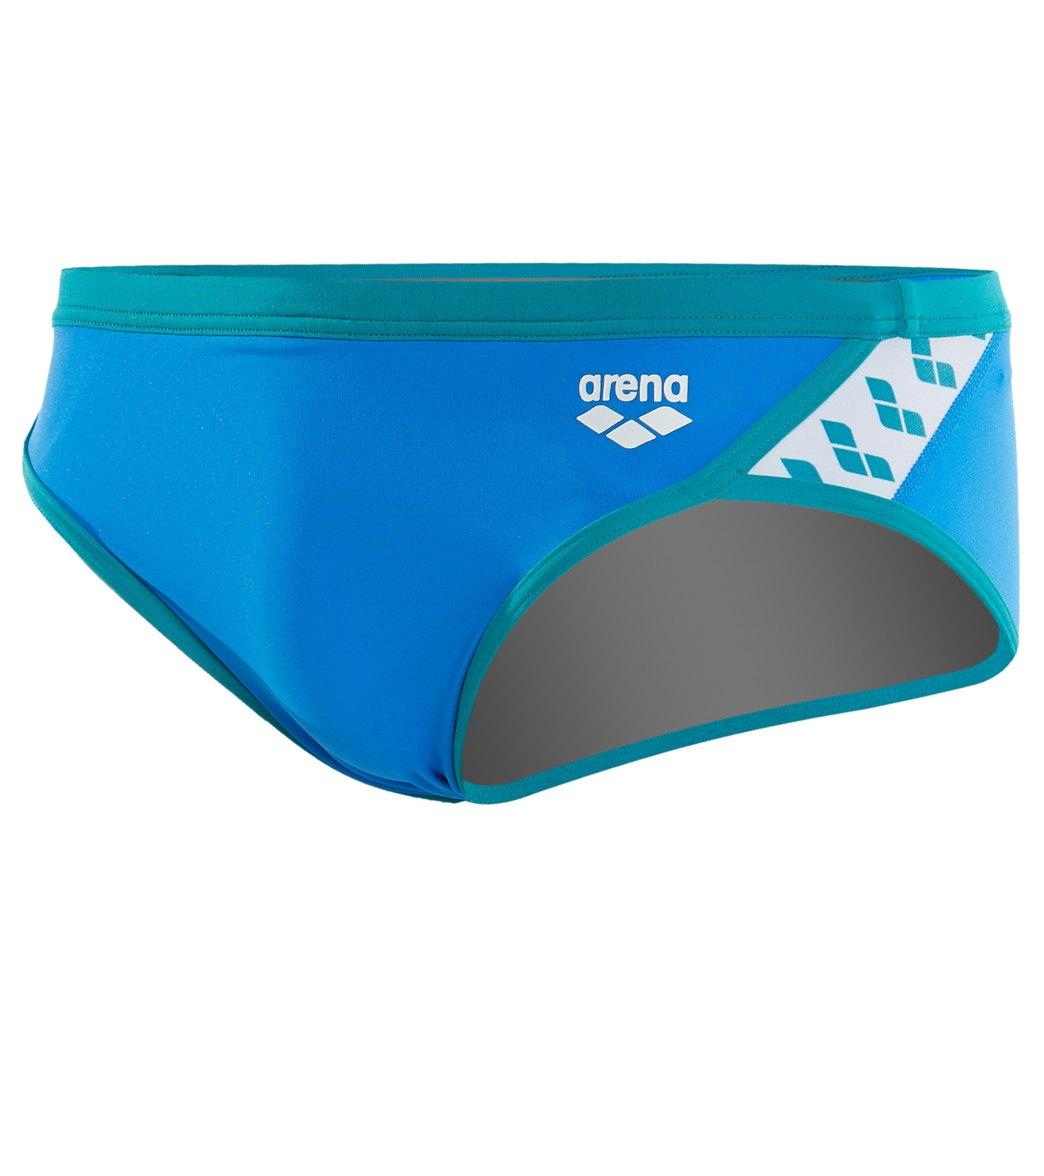 842be0ceb6de3 Arena Men's Team Stripe Brief Swimsuit at SwimOutlet.com